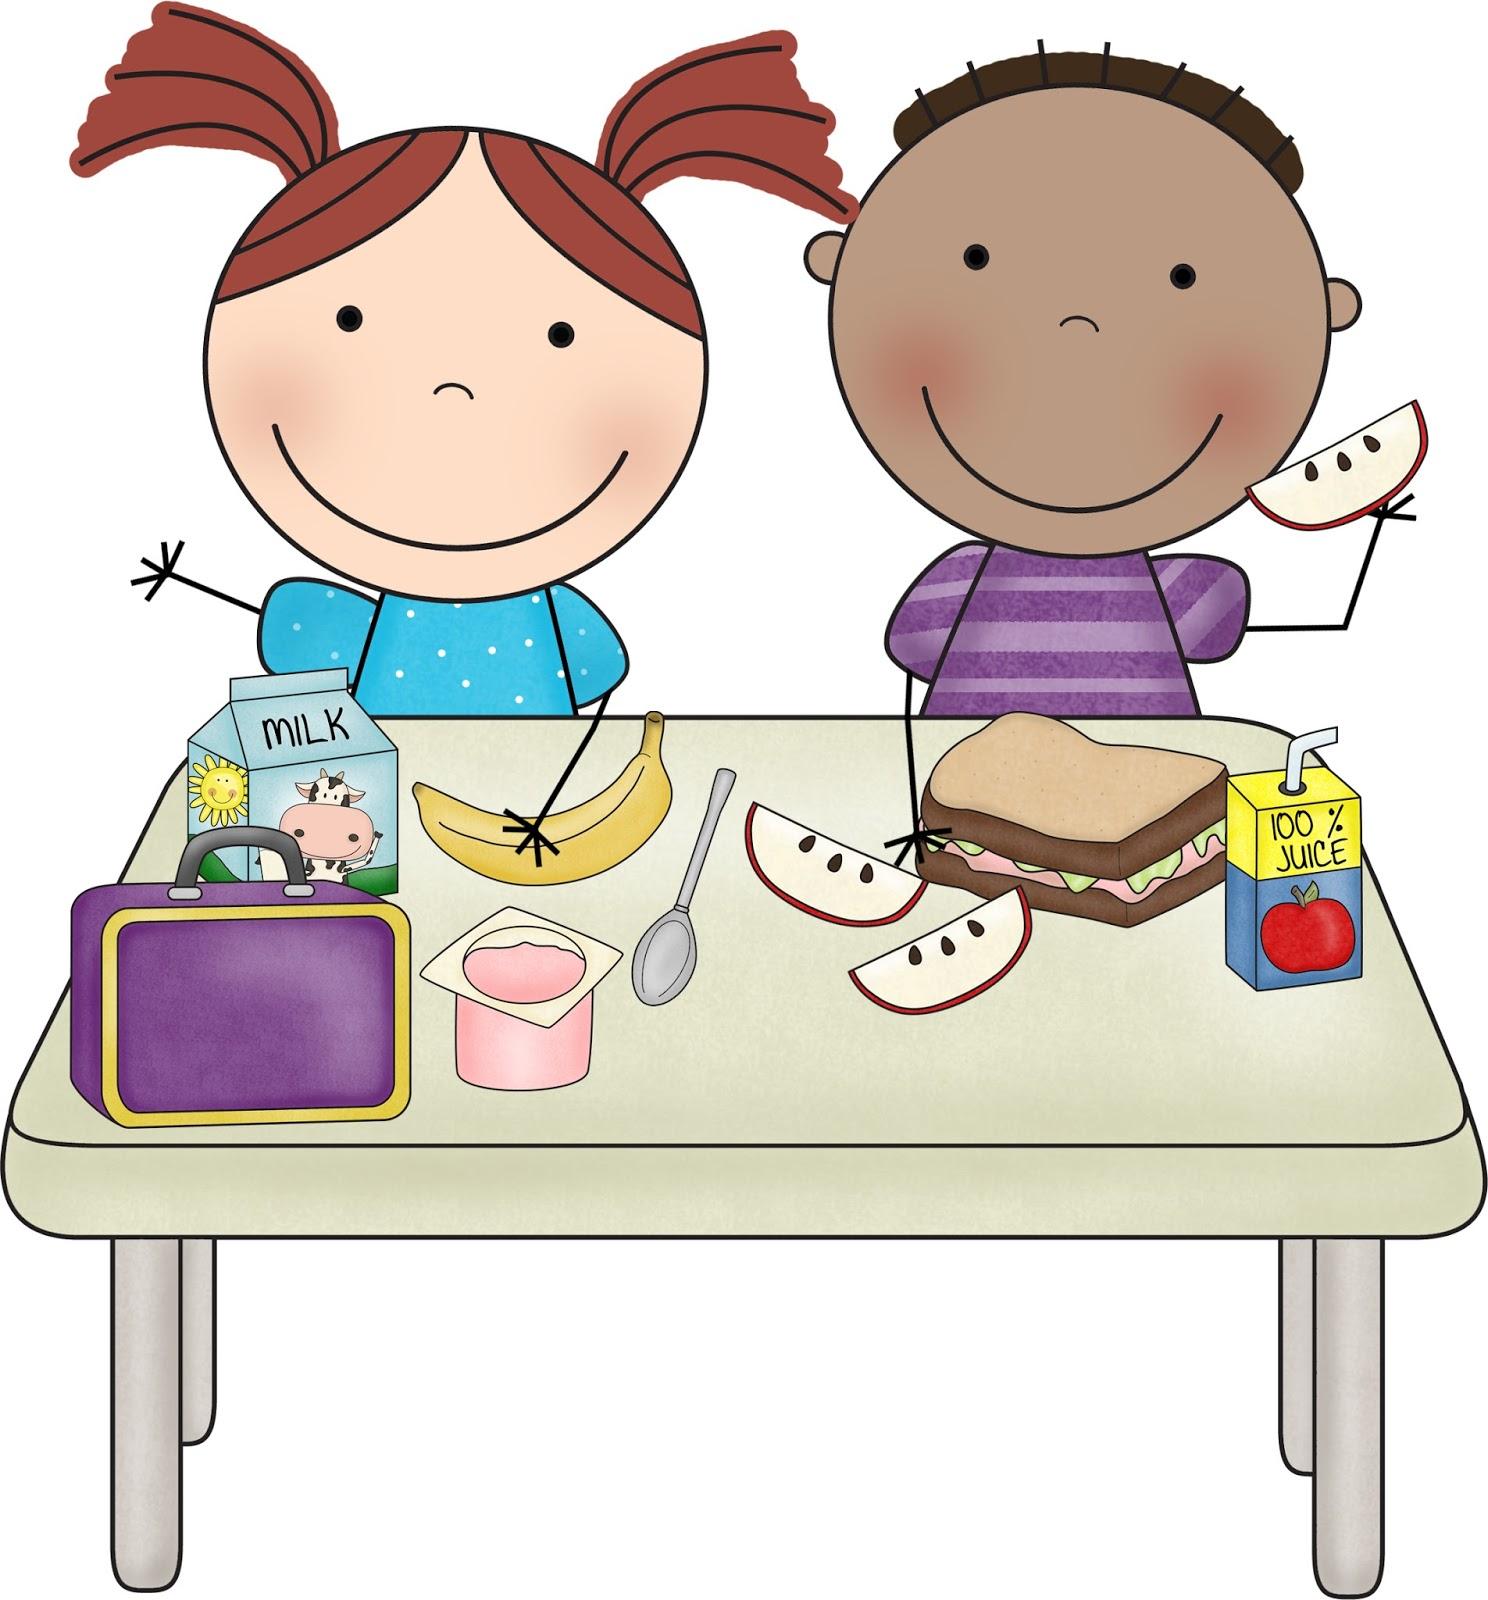 Clipart kindergarten clip free library Clip art for kindergarten clipart - Clipartix clip free library